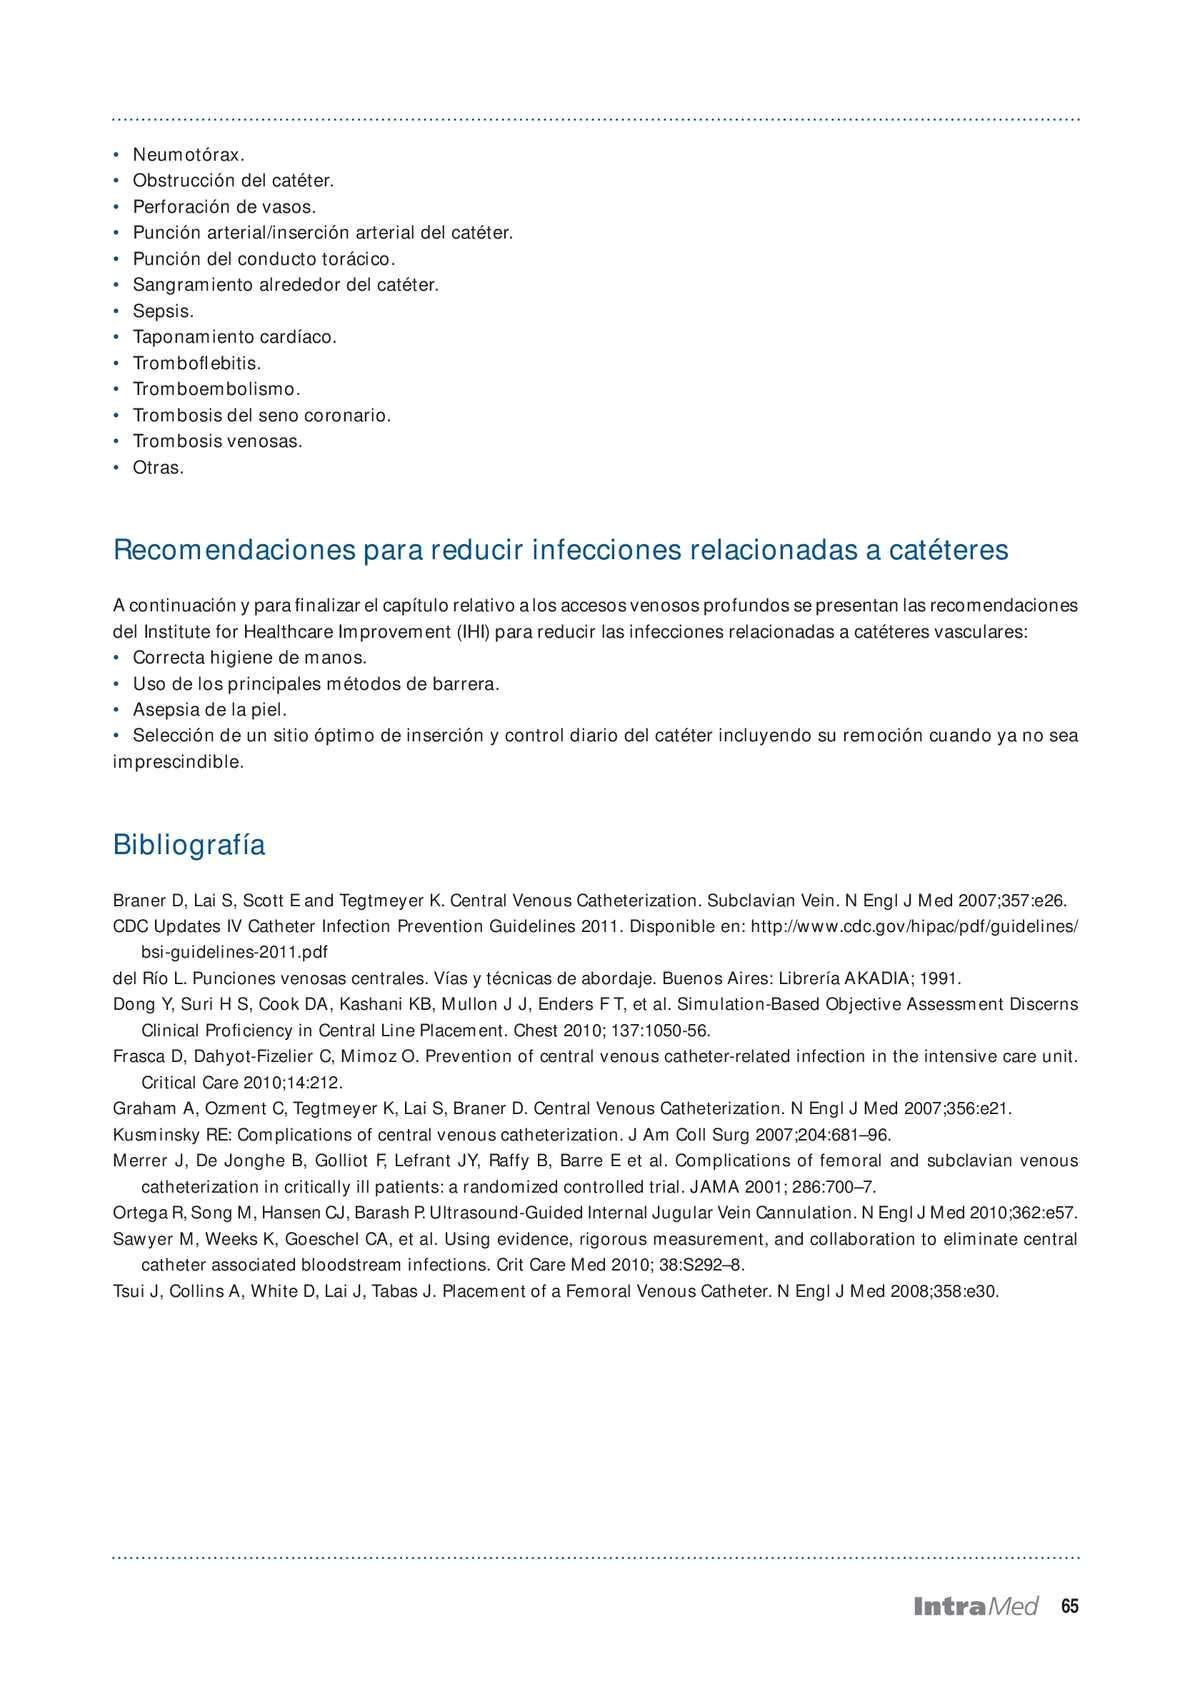 Manual Medicina Intensiva - CALAMEO Downloader